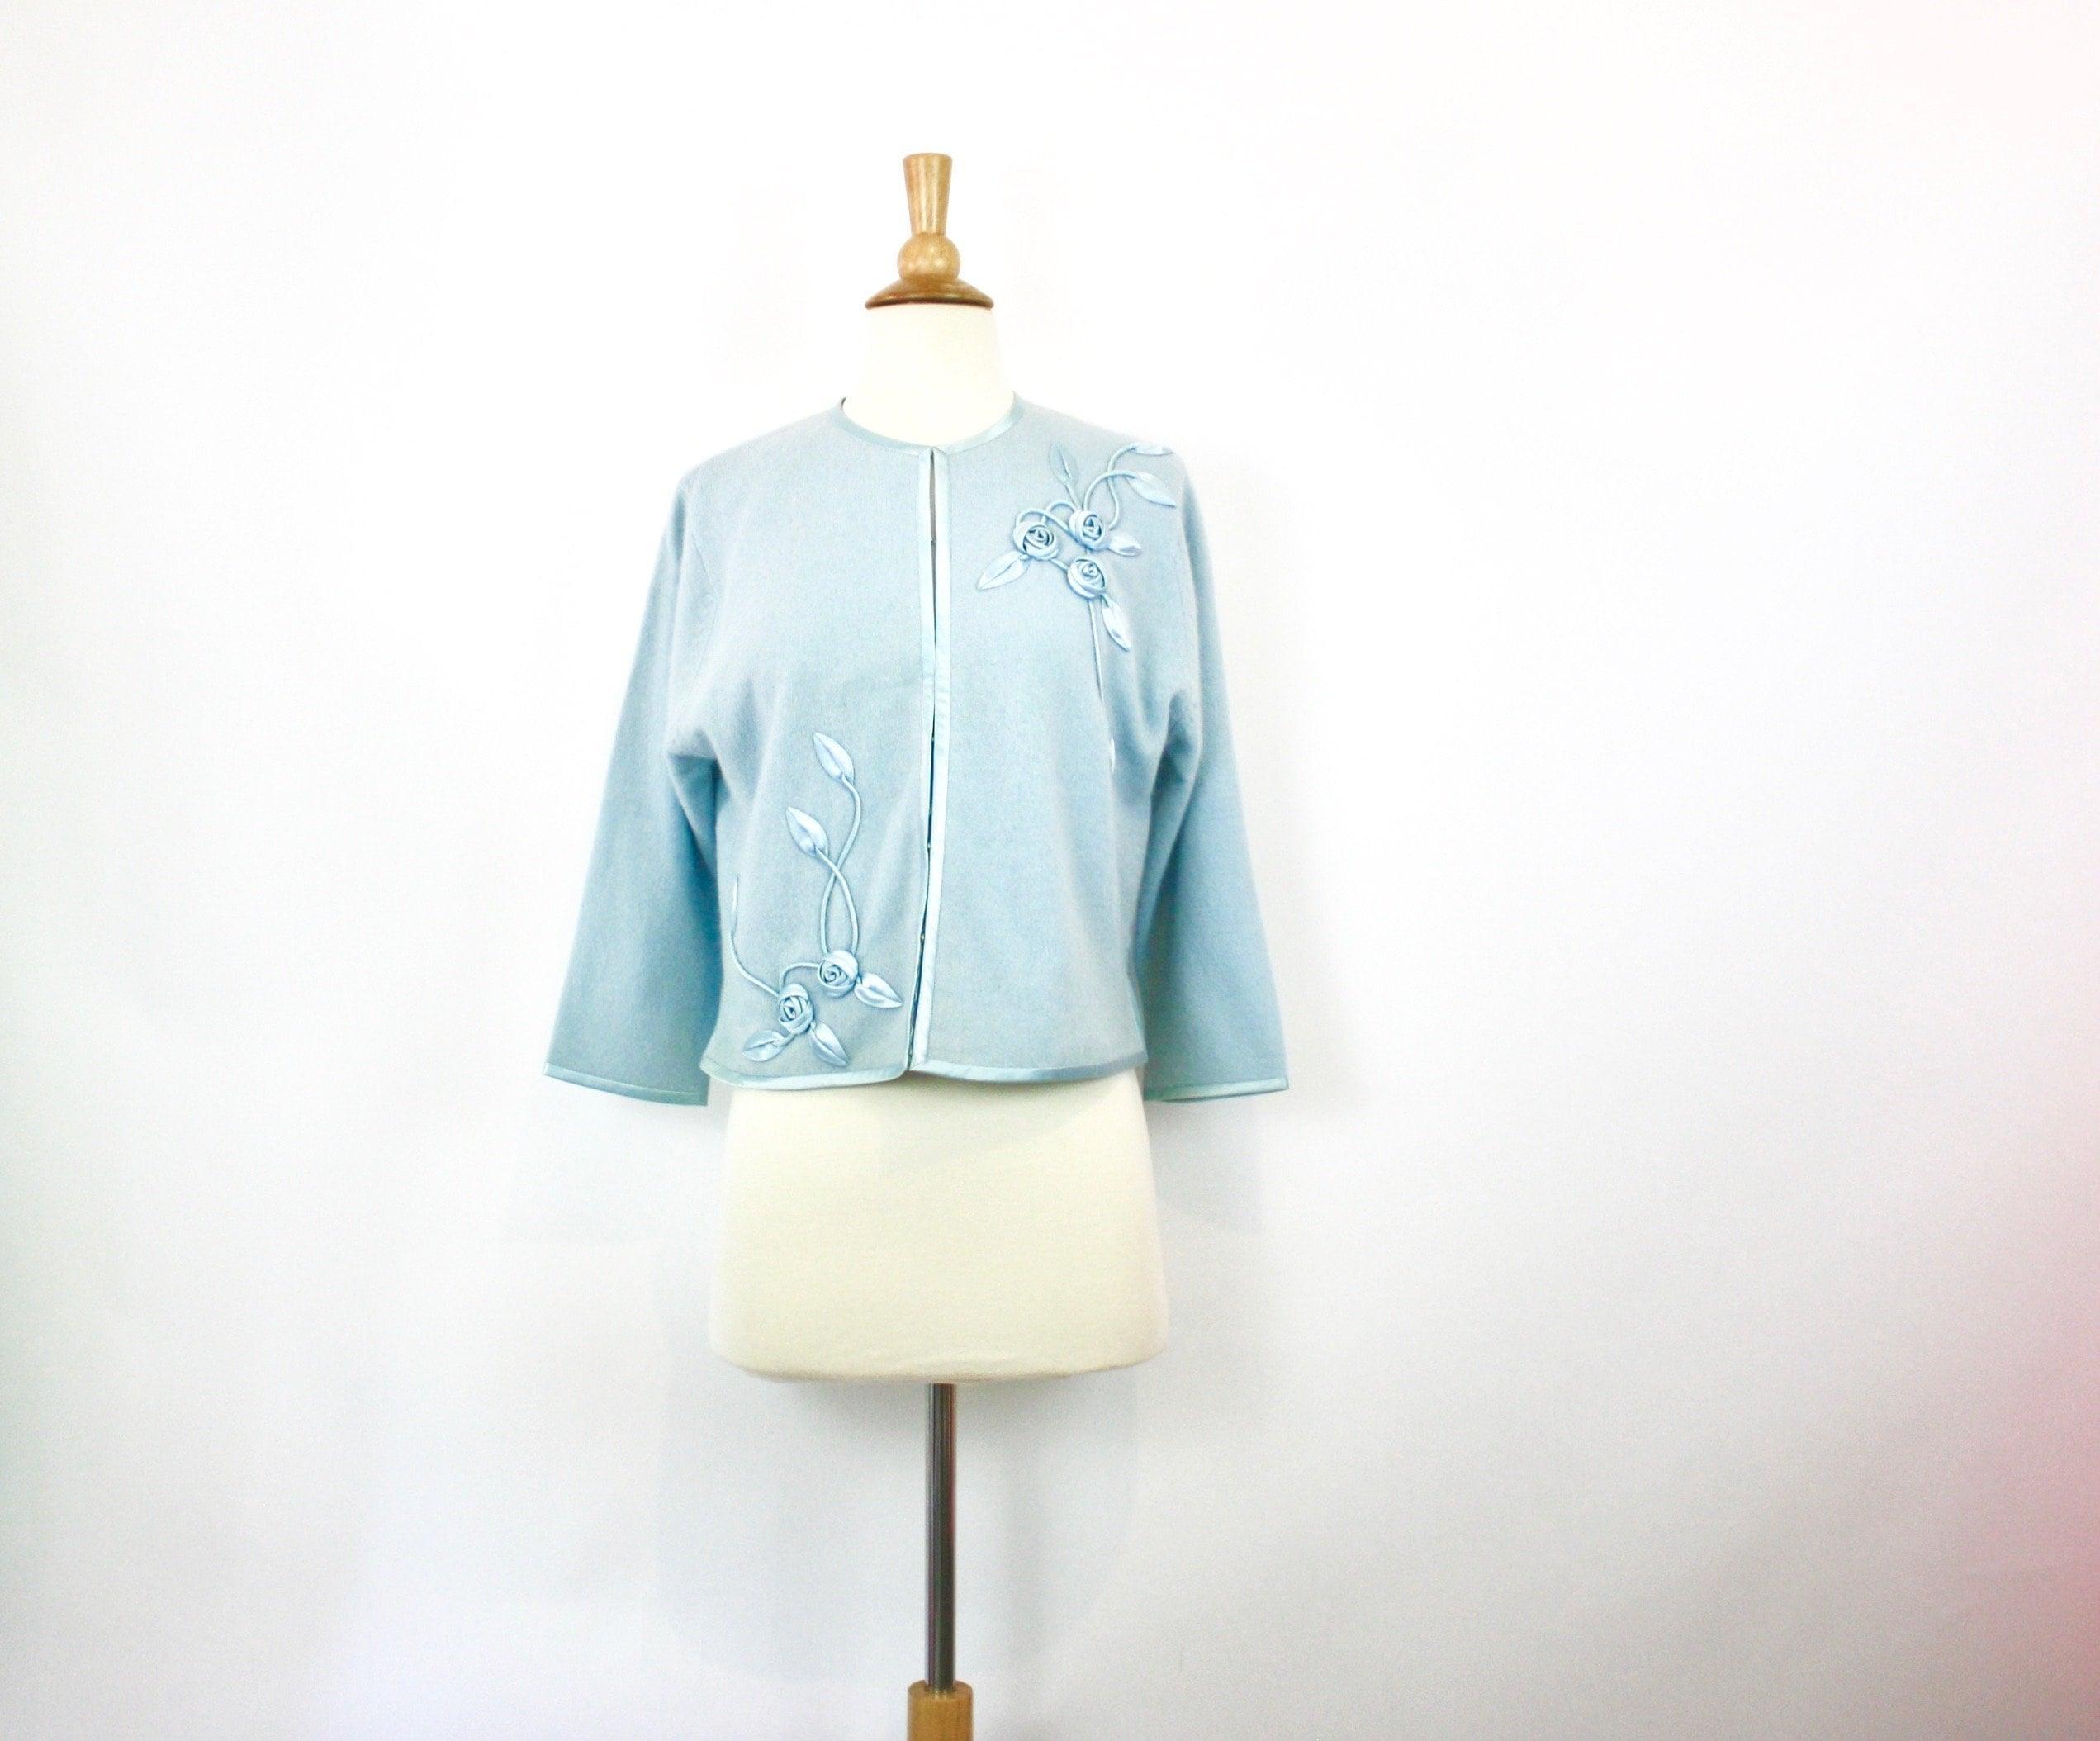 8643b40c47 Vintage 50s Cardigan Sweater Blue Angora Wool w Satin Flowers